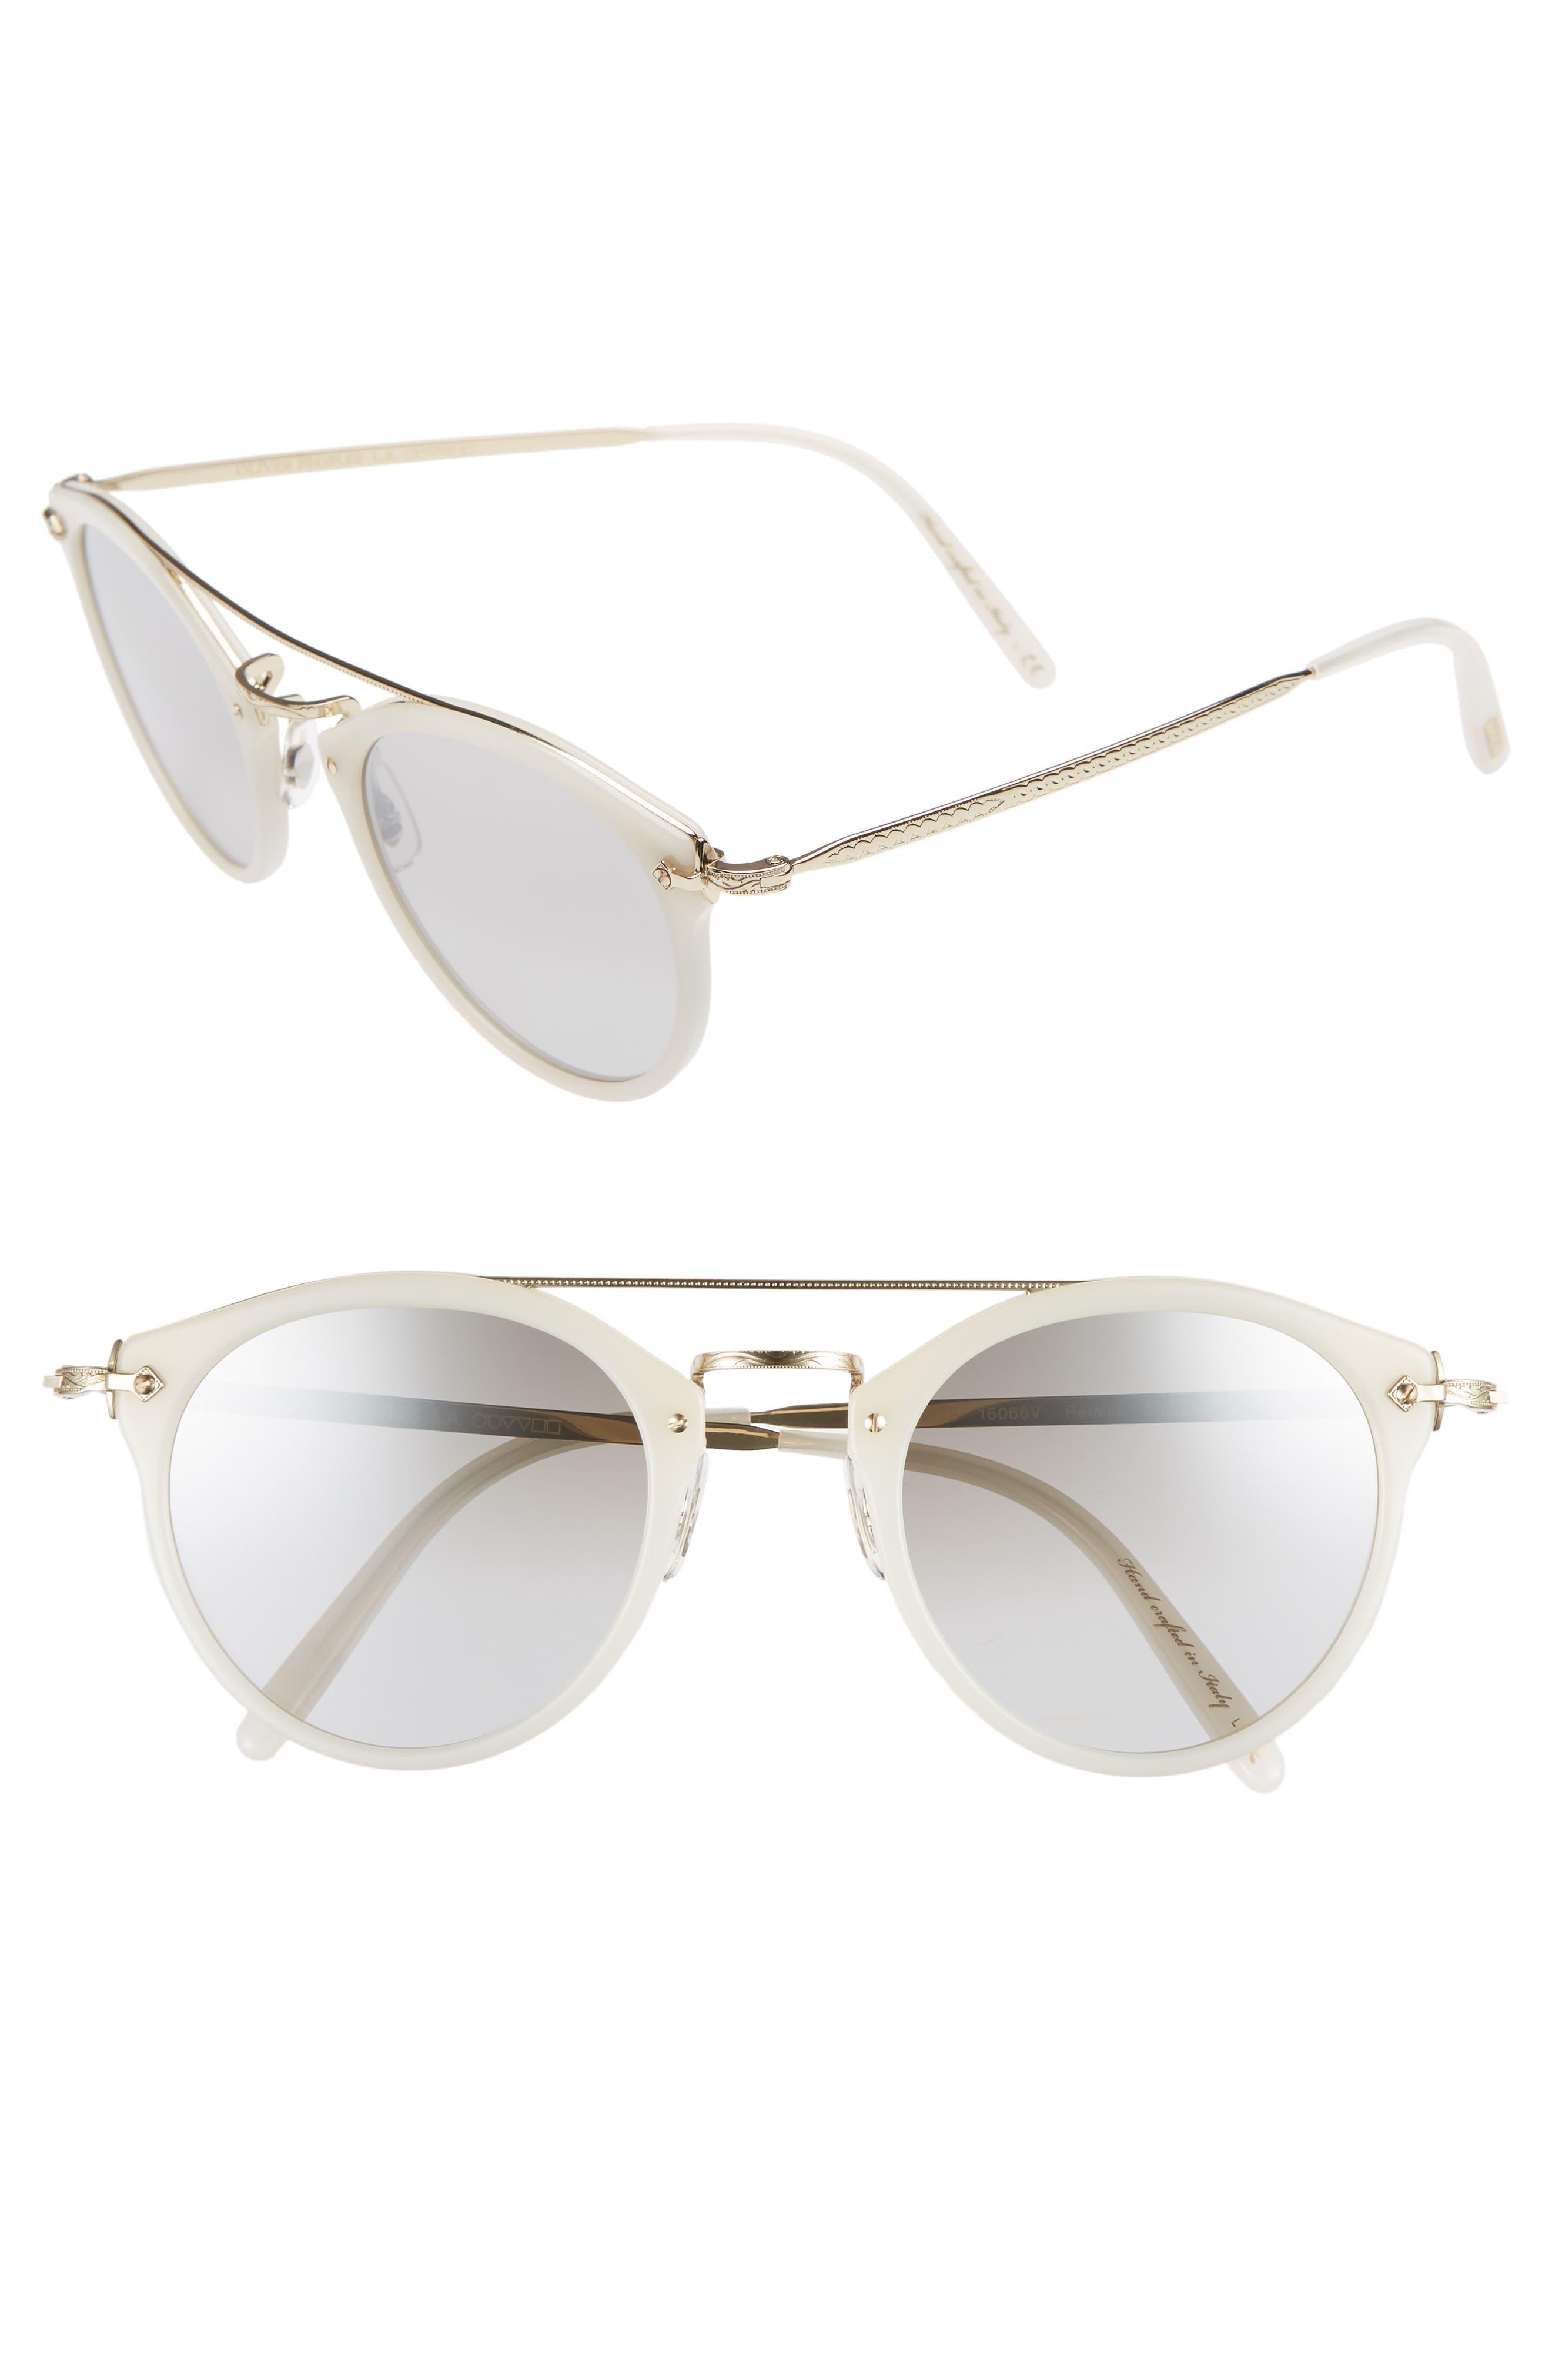 Remick 50mm Brow Bar Sunglasses,                         Main,                         color, 100